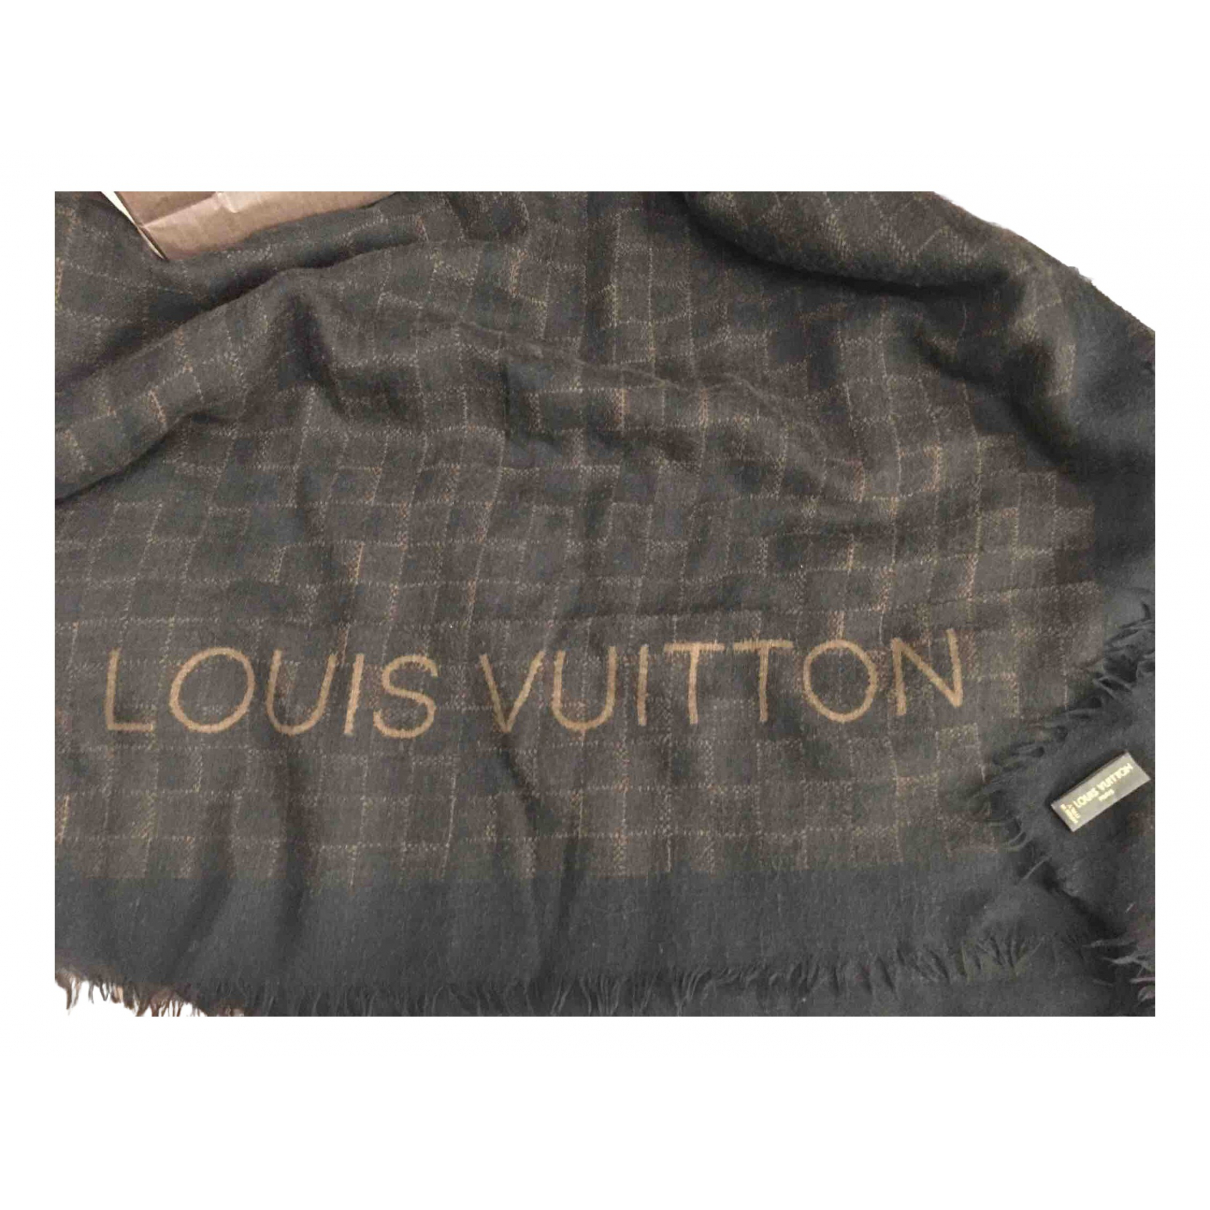 Estola de Cachemira Louis Vuitton